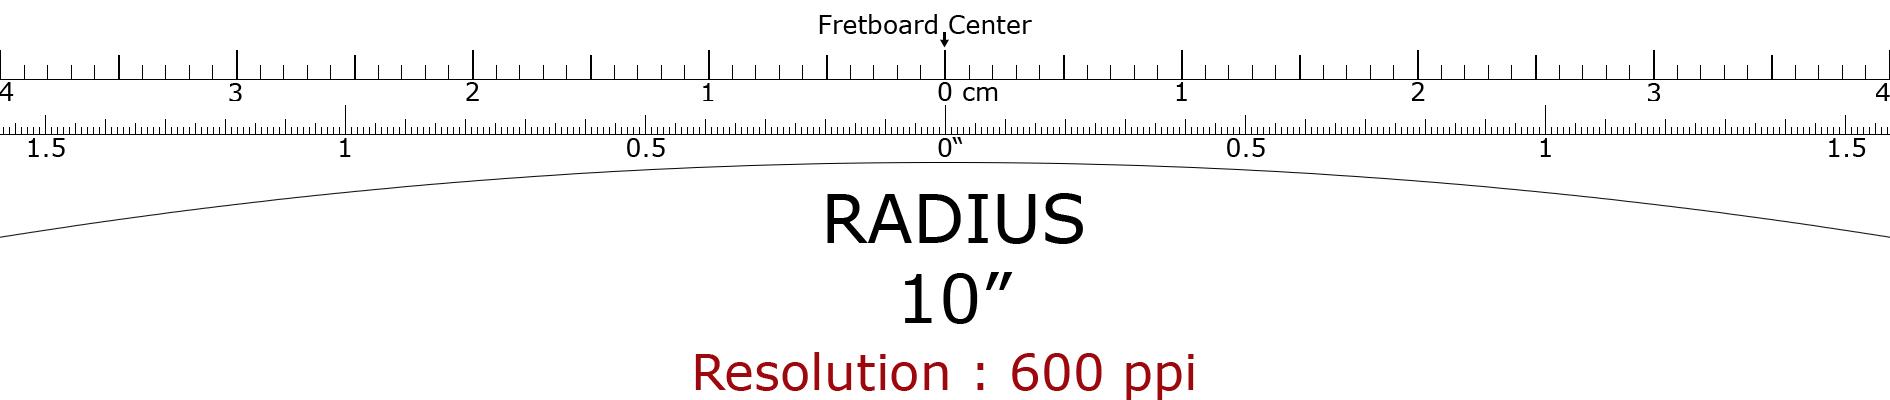 file radius 10 wikimedia commons. Black Bedroom Furniture Sets. Home Design Ideas